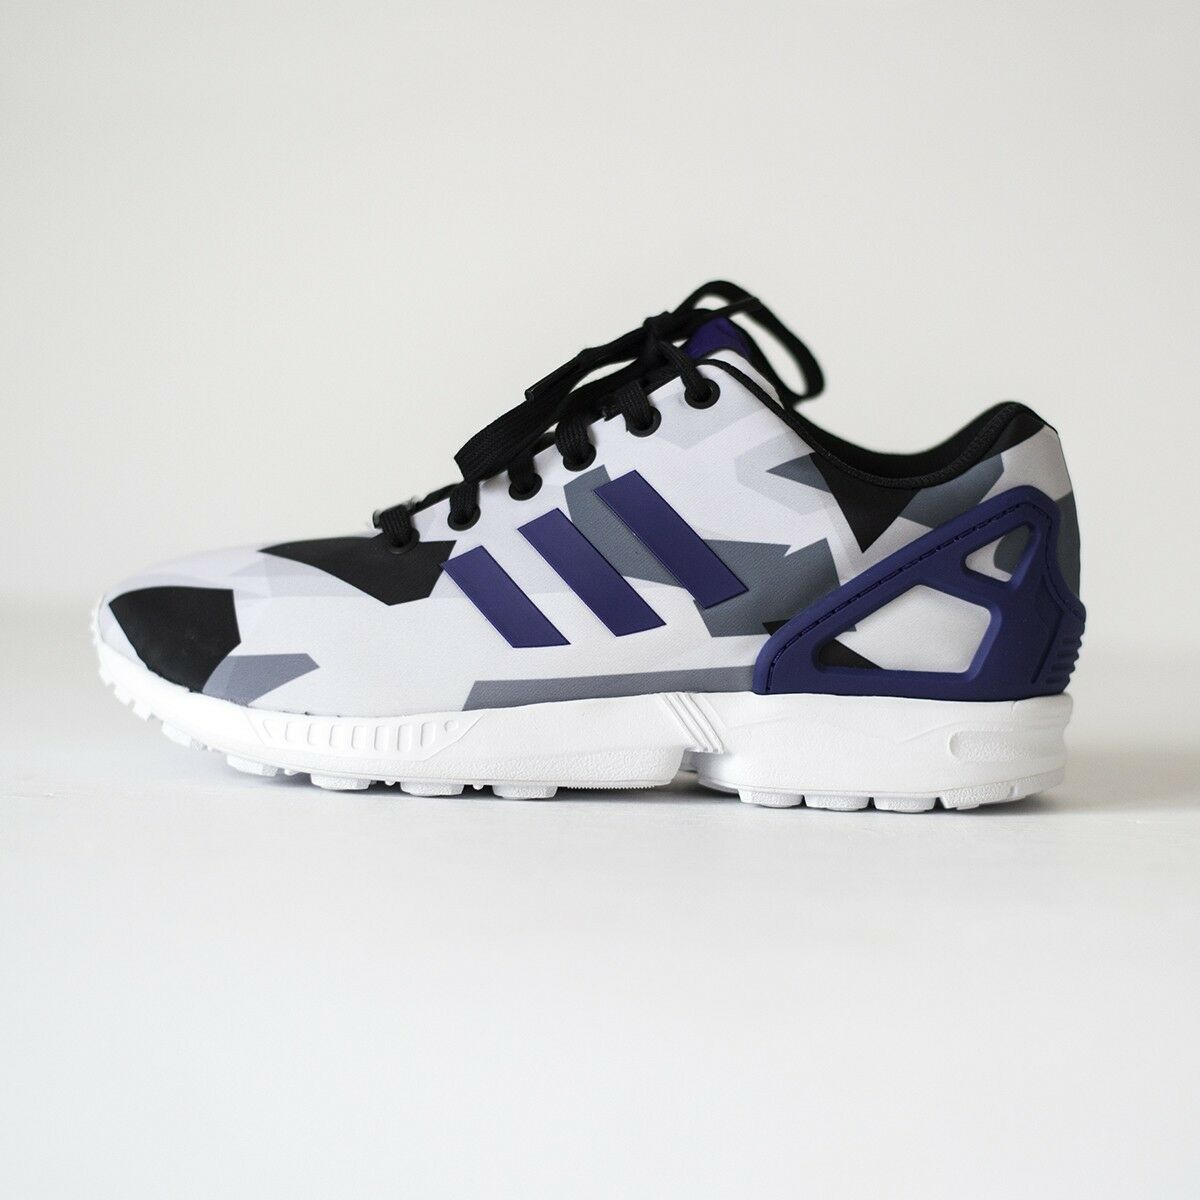 Adidas ZX Flux Para hombres Zapatos para correr blancoas Collegiate Púrpura Core Negro B34517